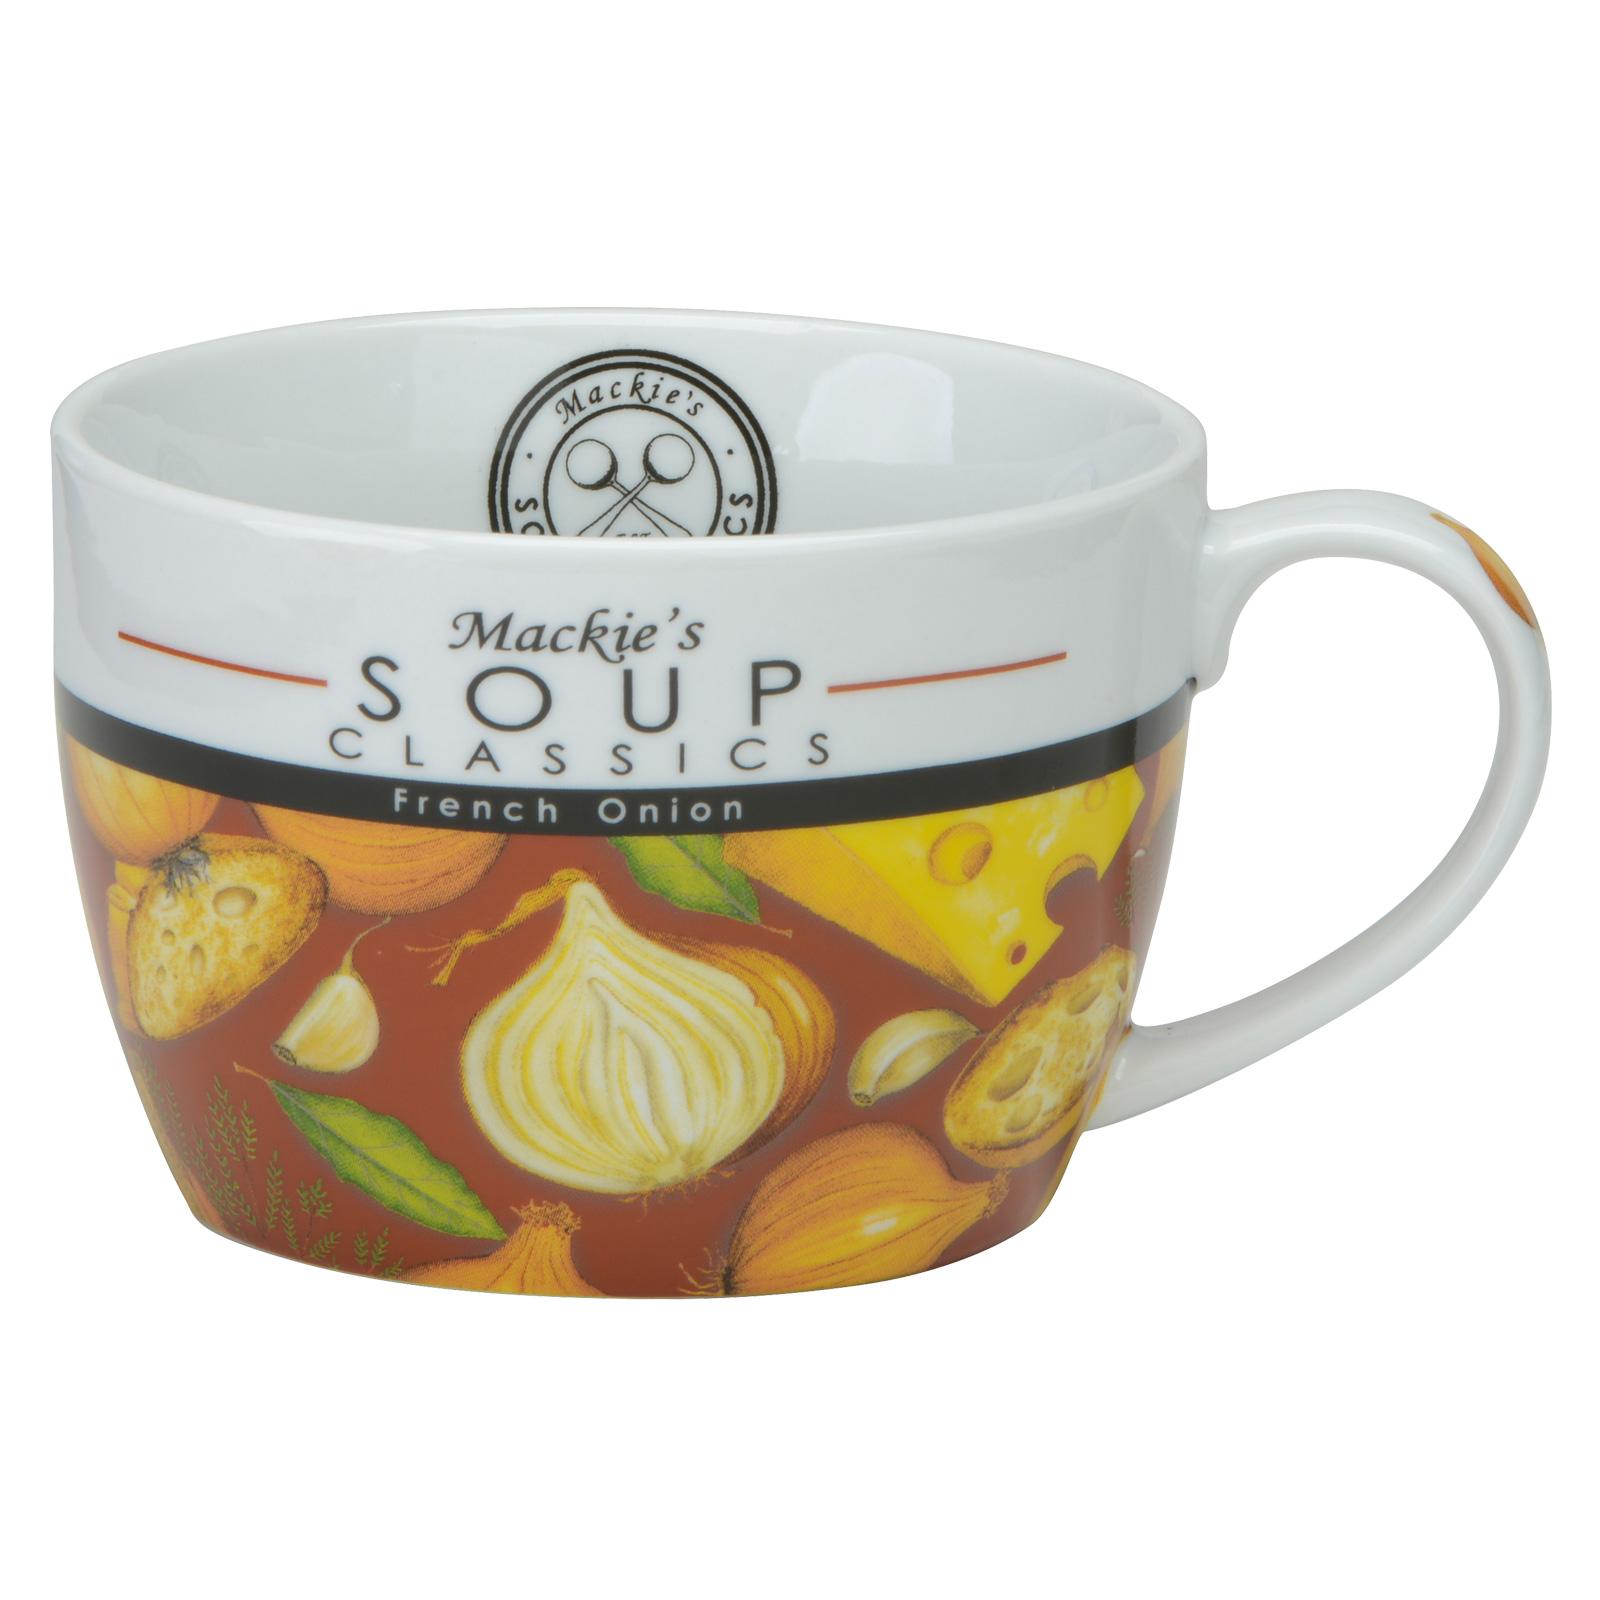 Mackie's French Onion Soup Mug by BIA